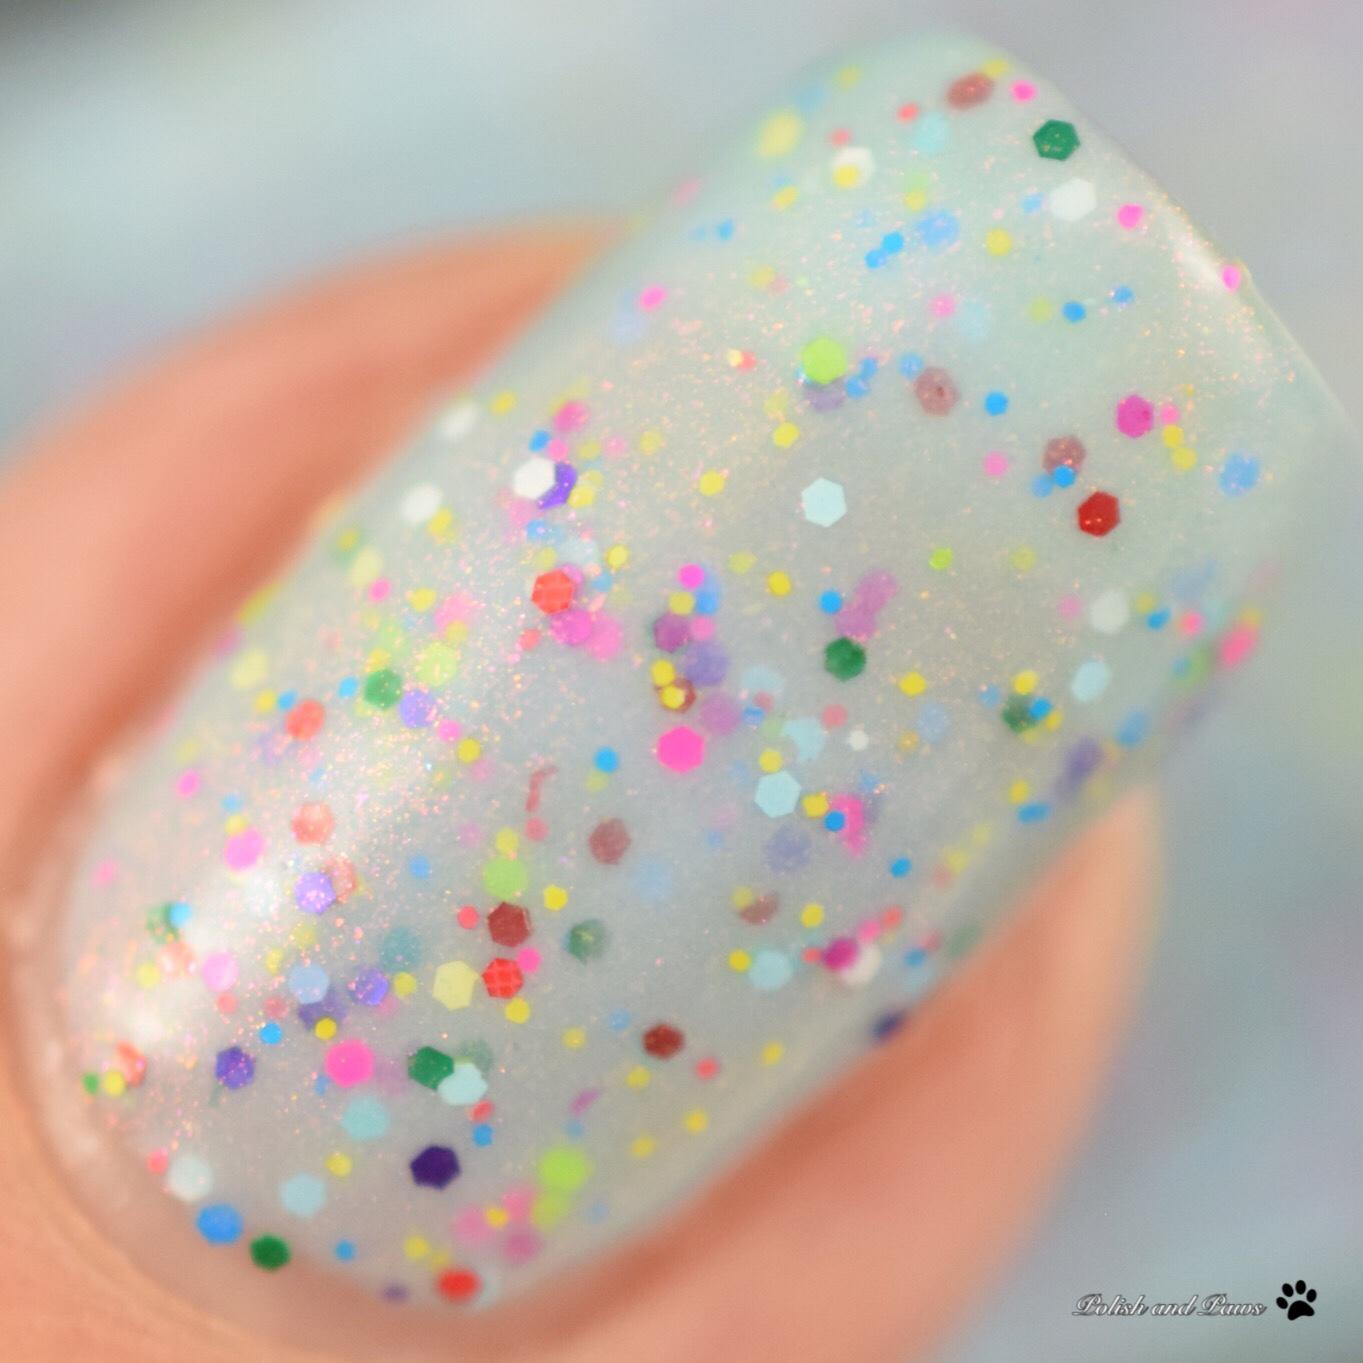 Glam Polish End of the Rainbow